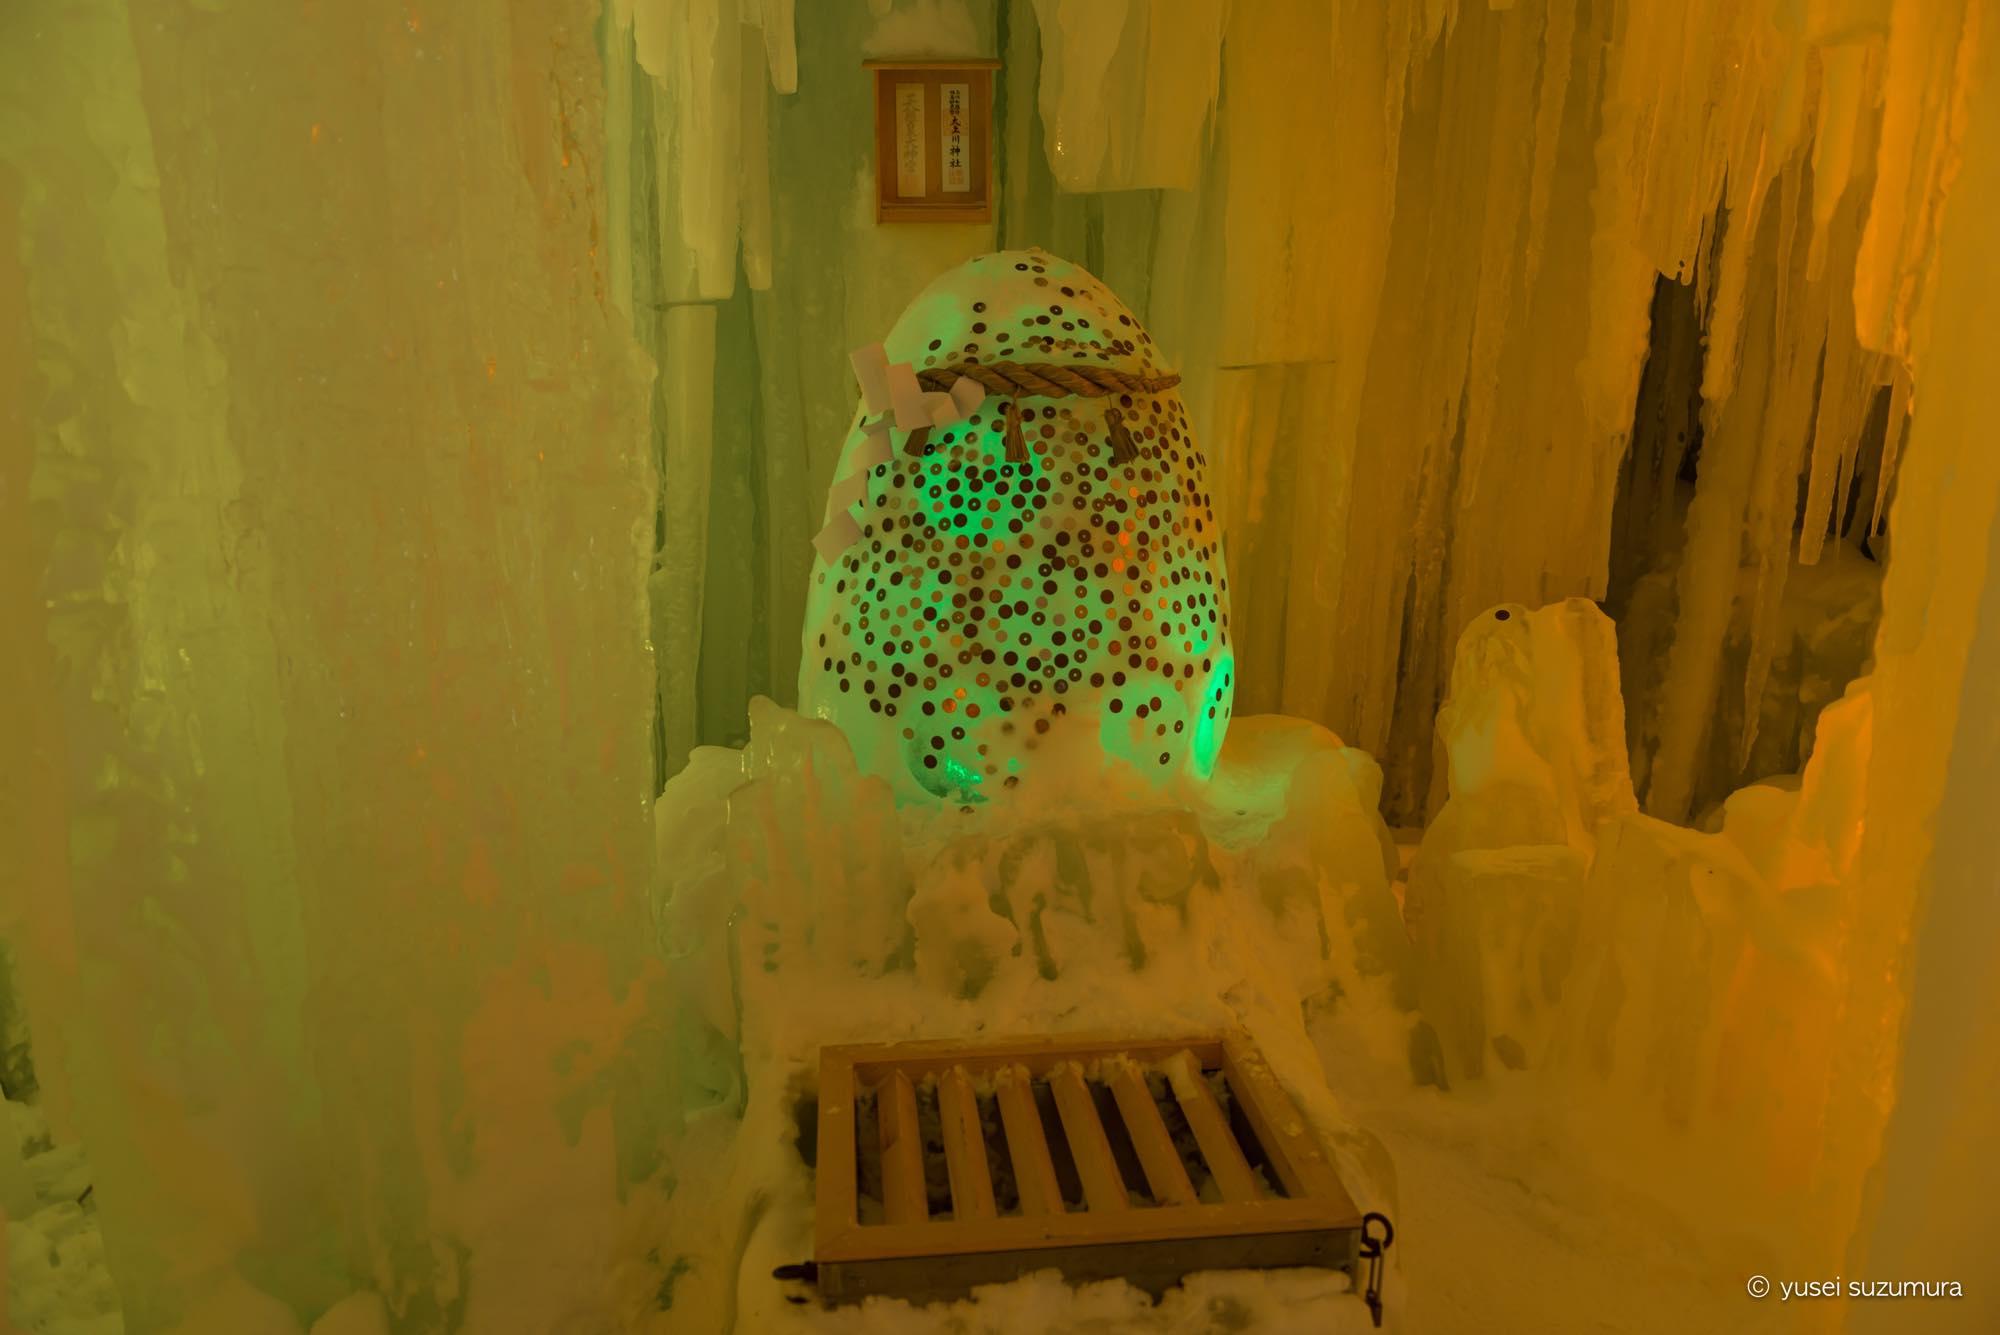 氷瀑神社 お賽銭箱